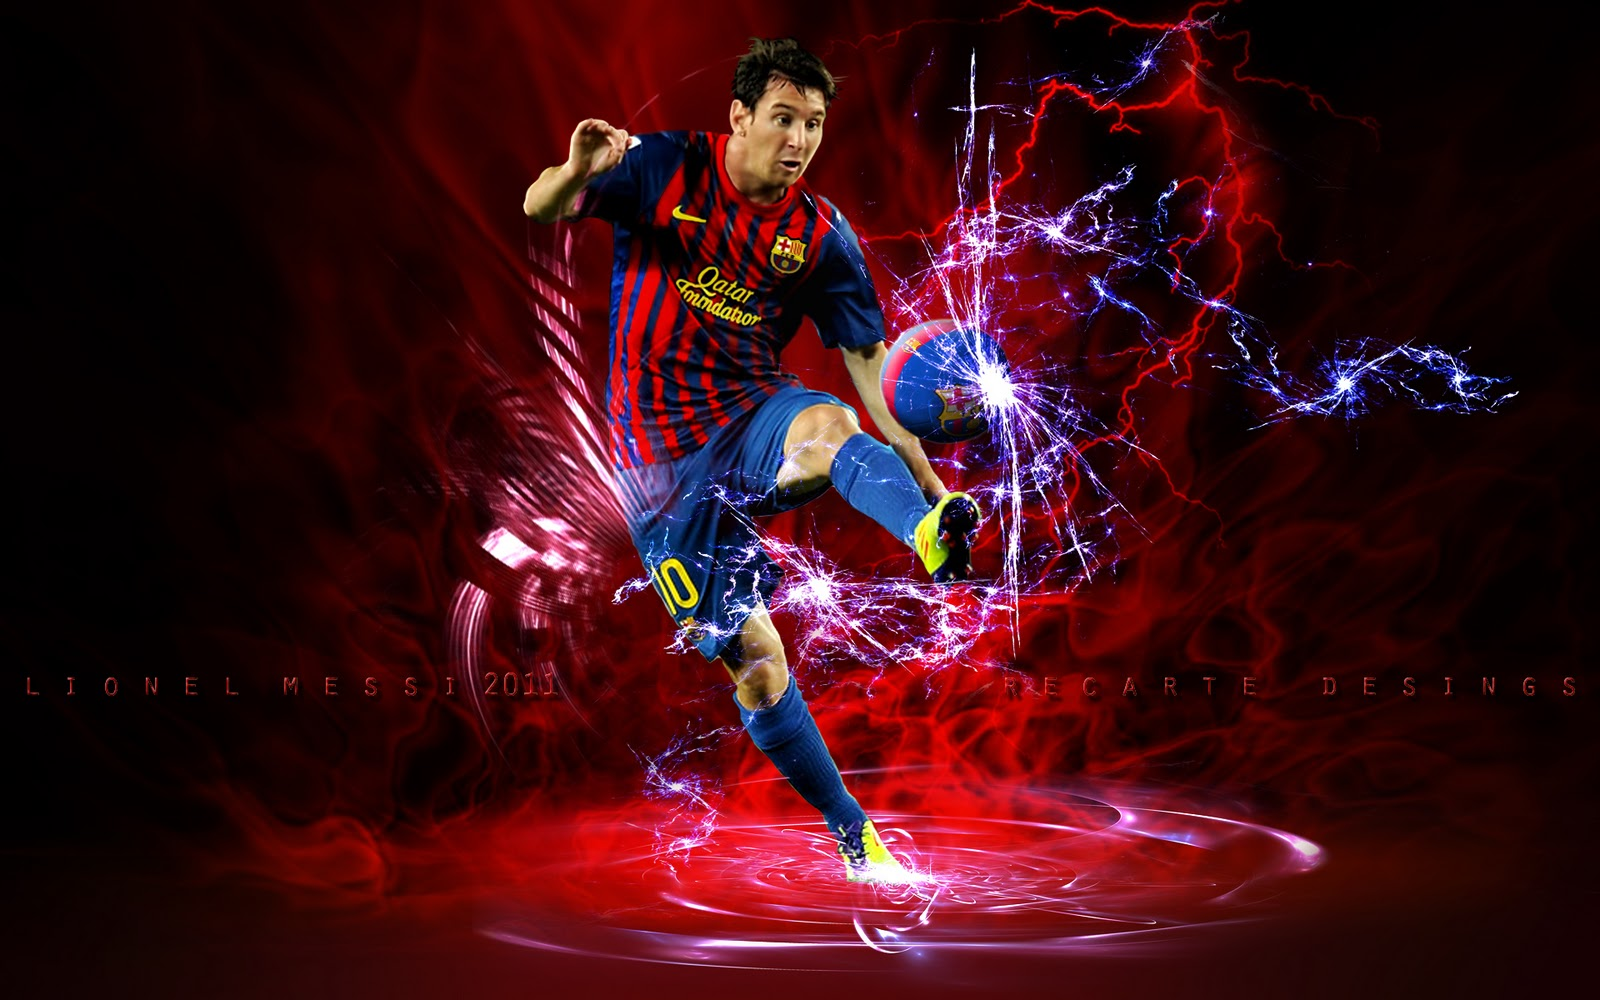 Lionel Messi HD Wallpapers 2012 Best 4U 1600x1000